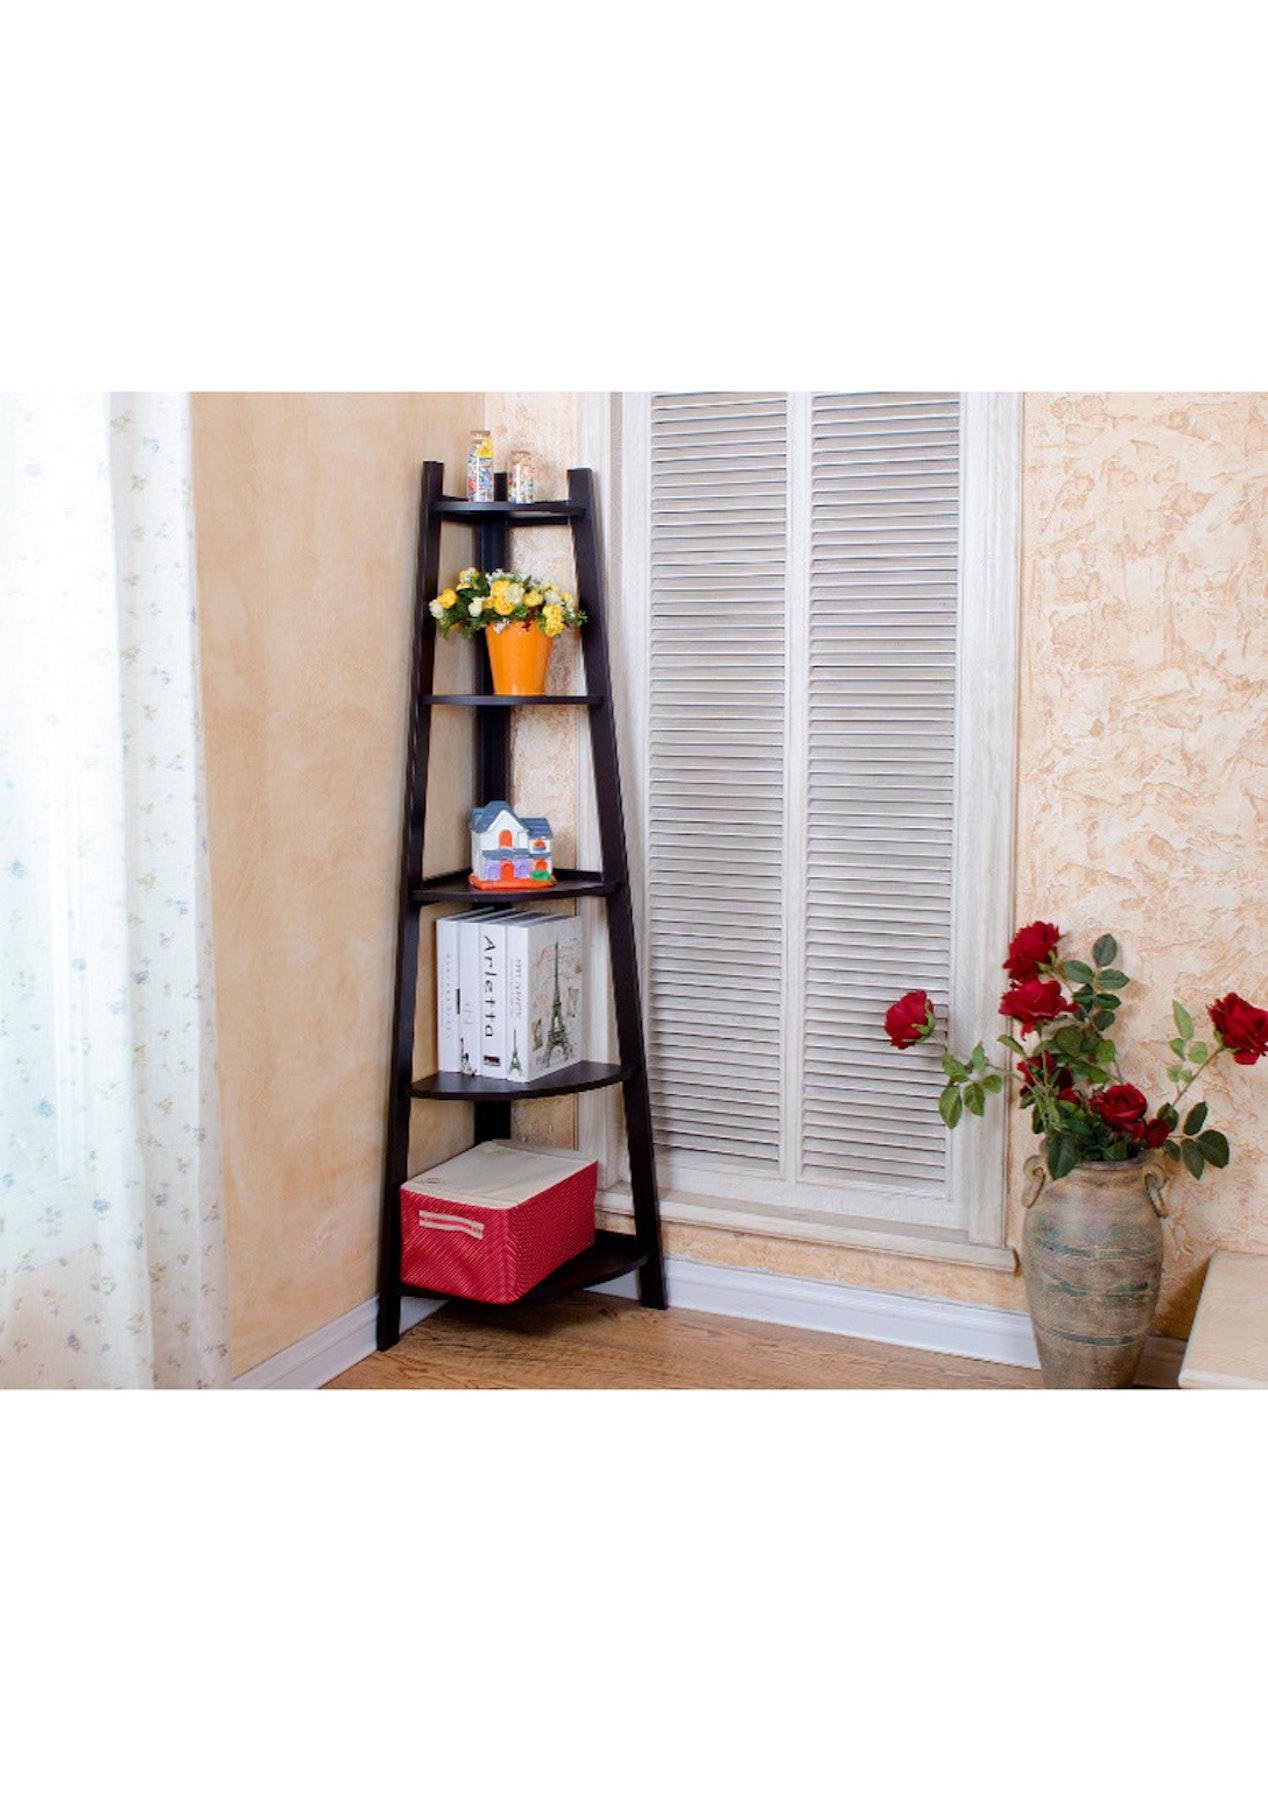 5 Tier Wooden Wall Corner Shelf  Dark Brown  Affordable